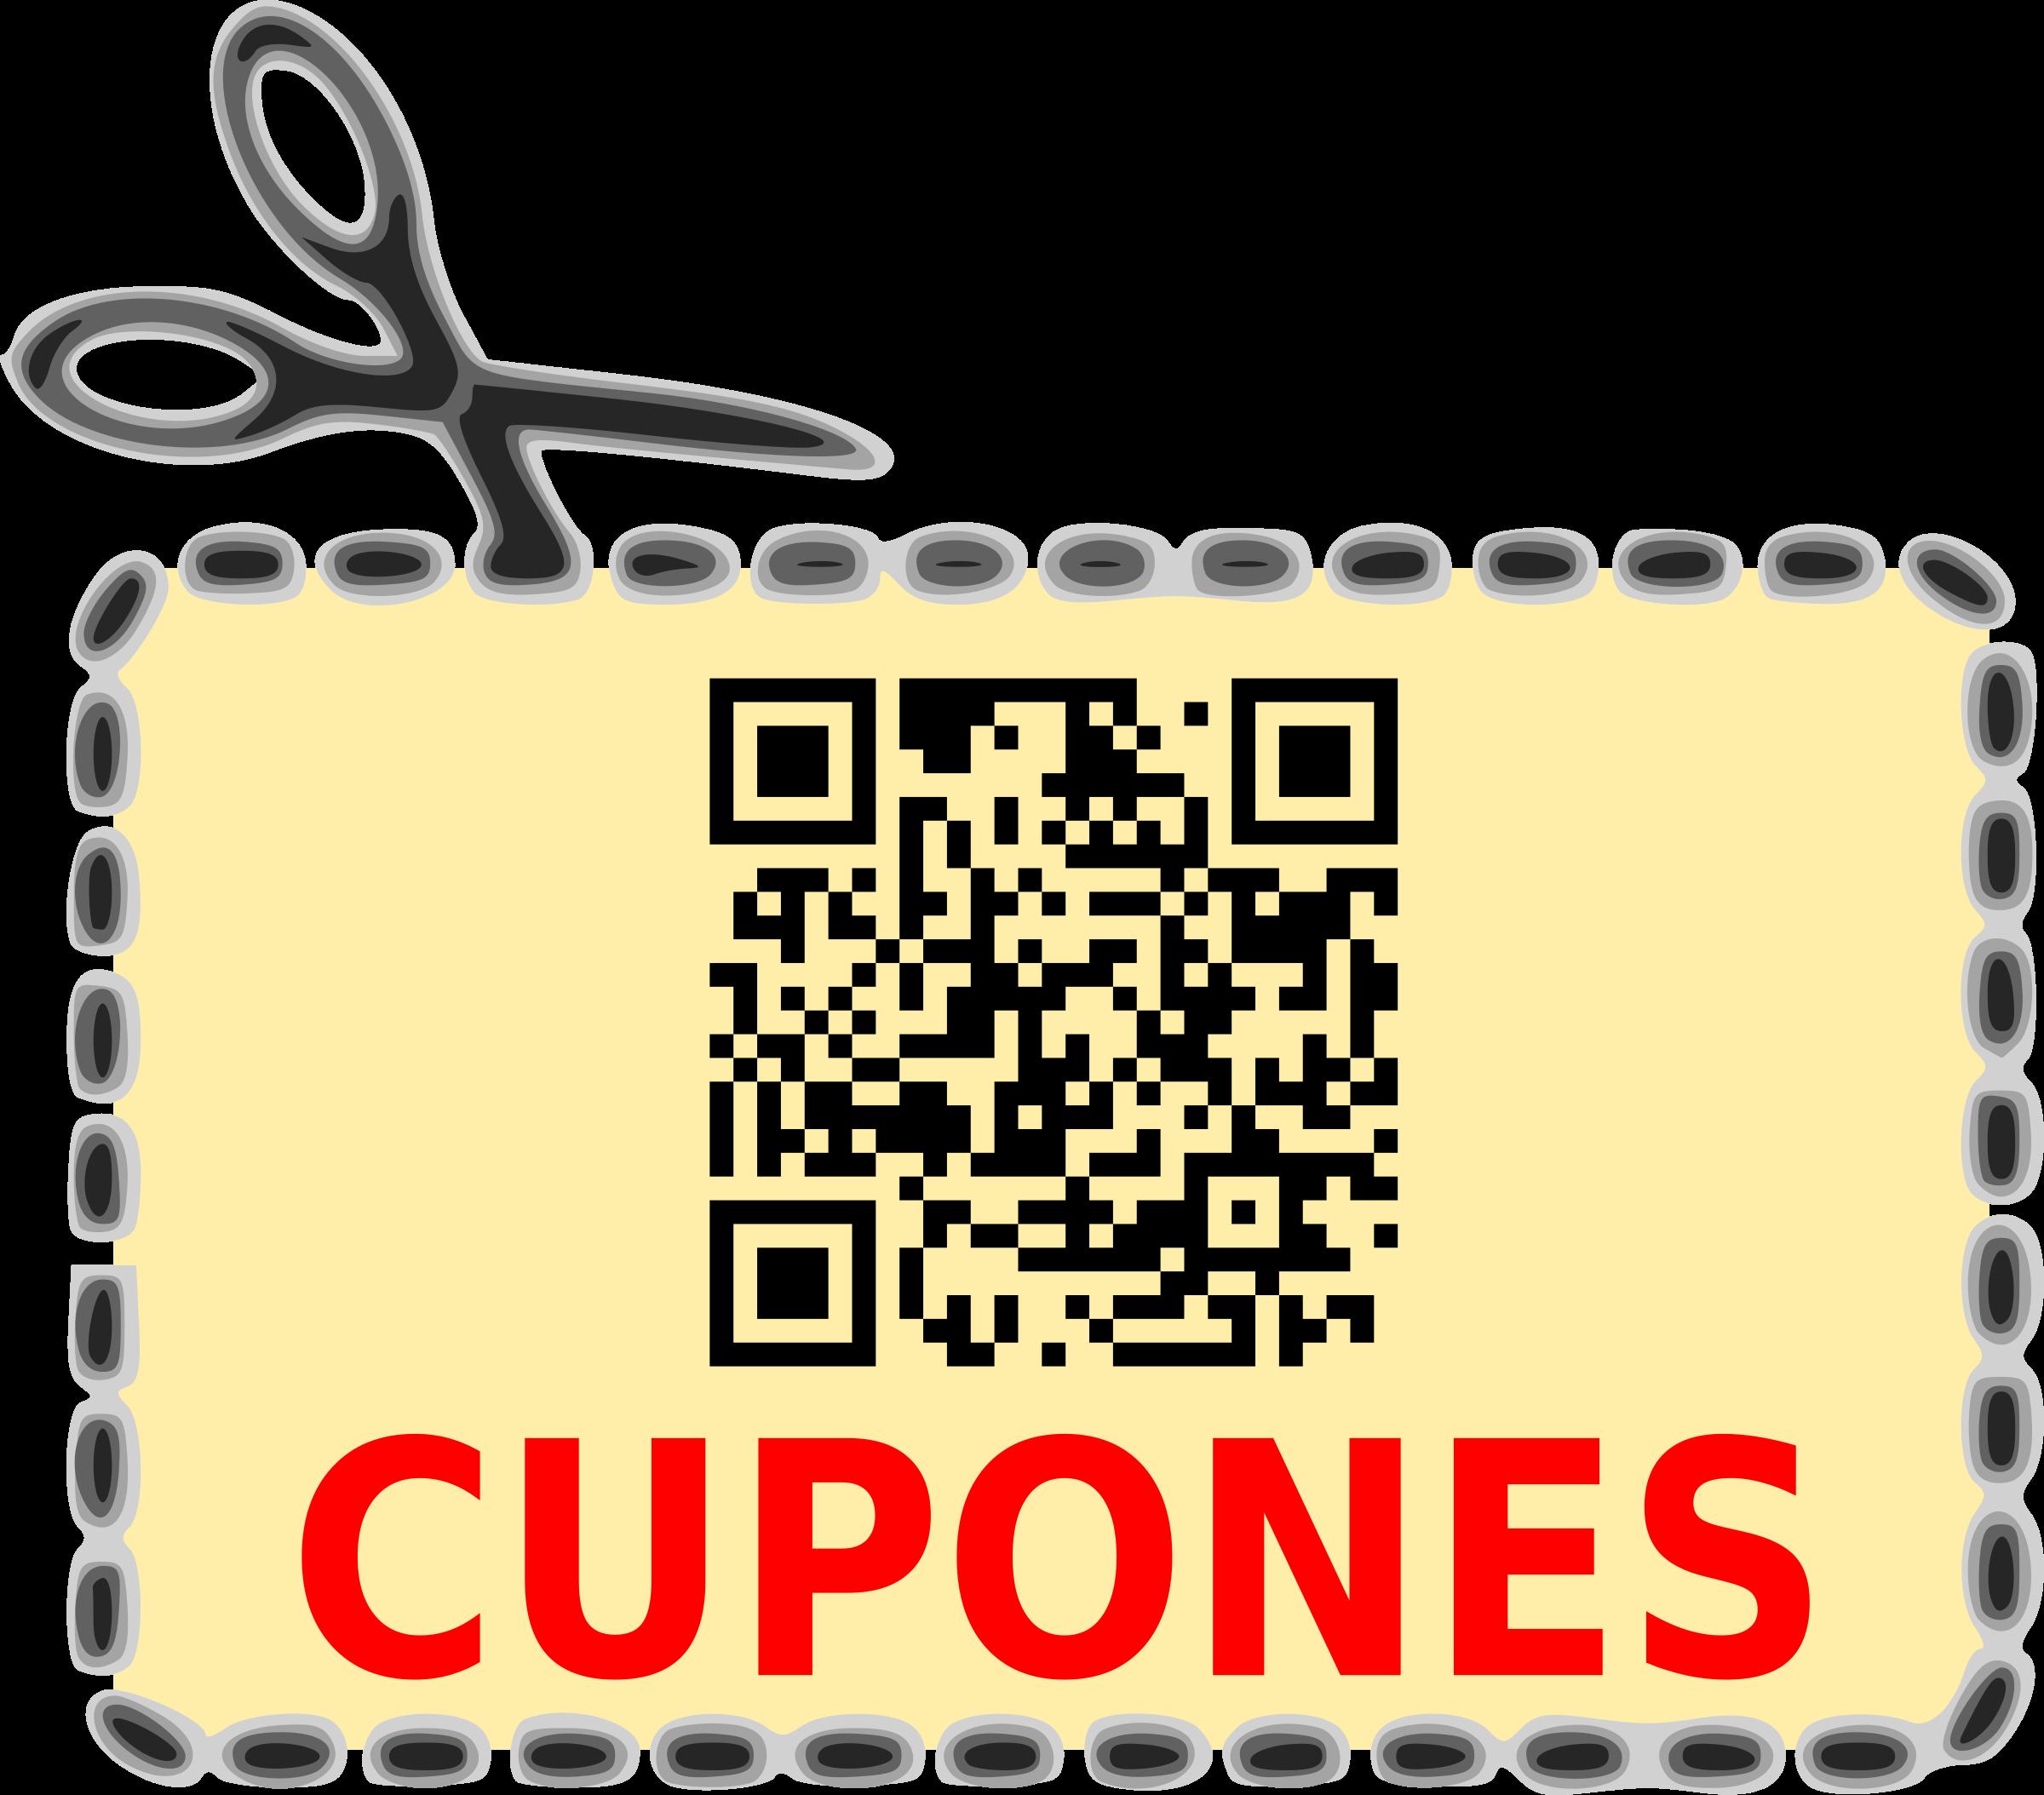 clip art free download Coupon clipart. Qr big image png